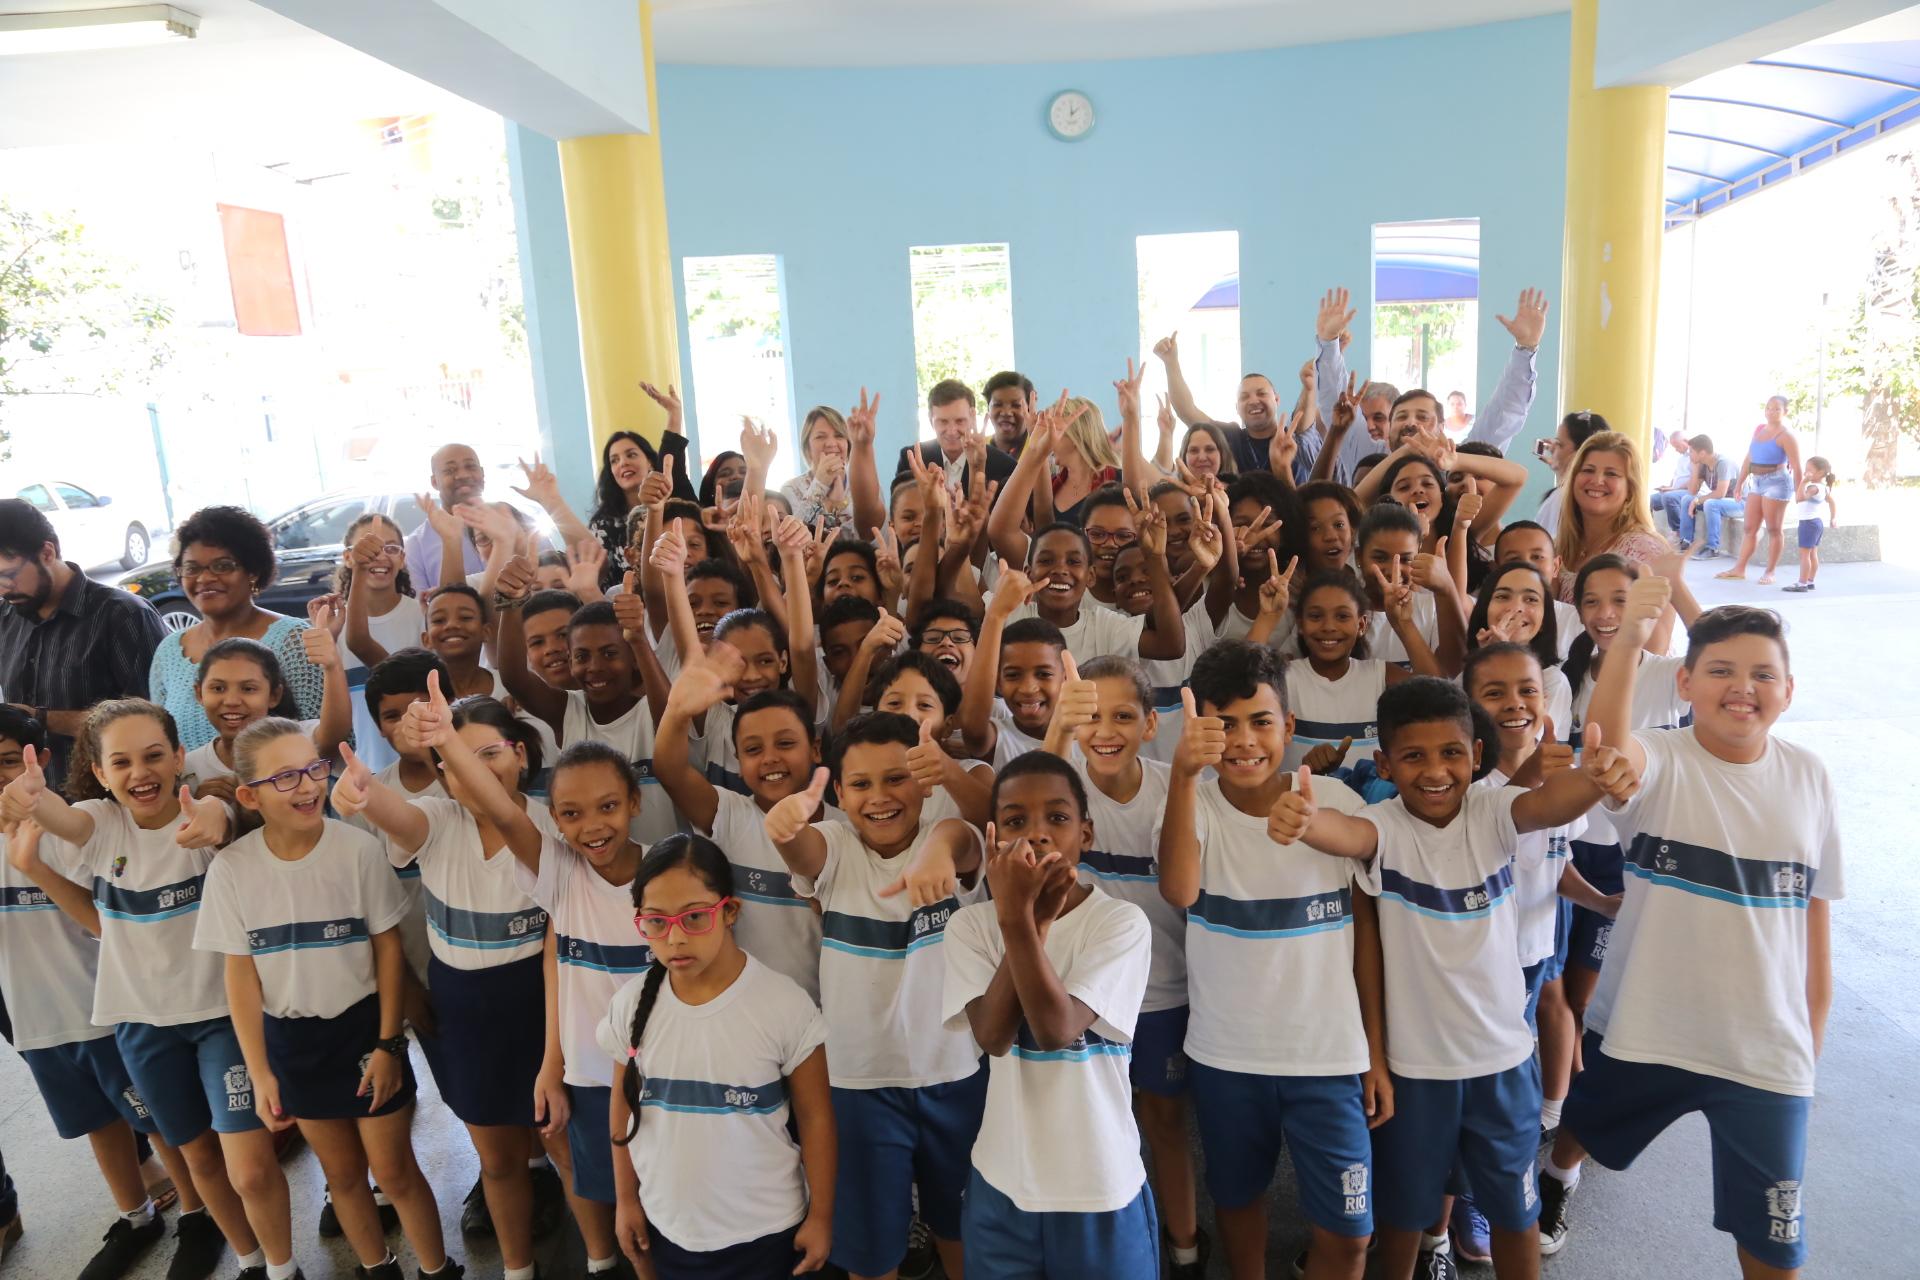 Prefeito visita escola bilíngue e elogia nível dos alunos